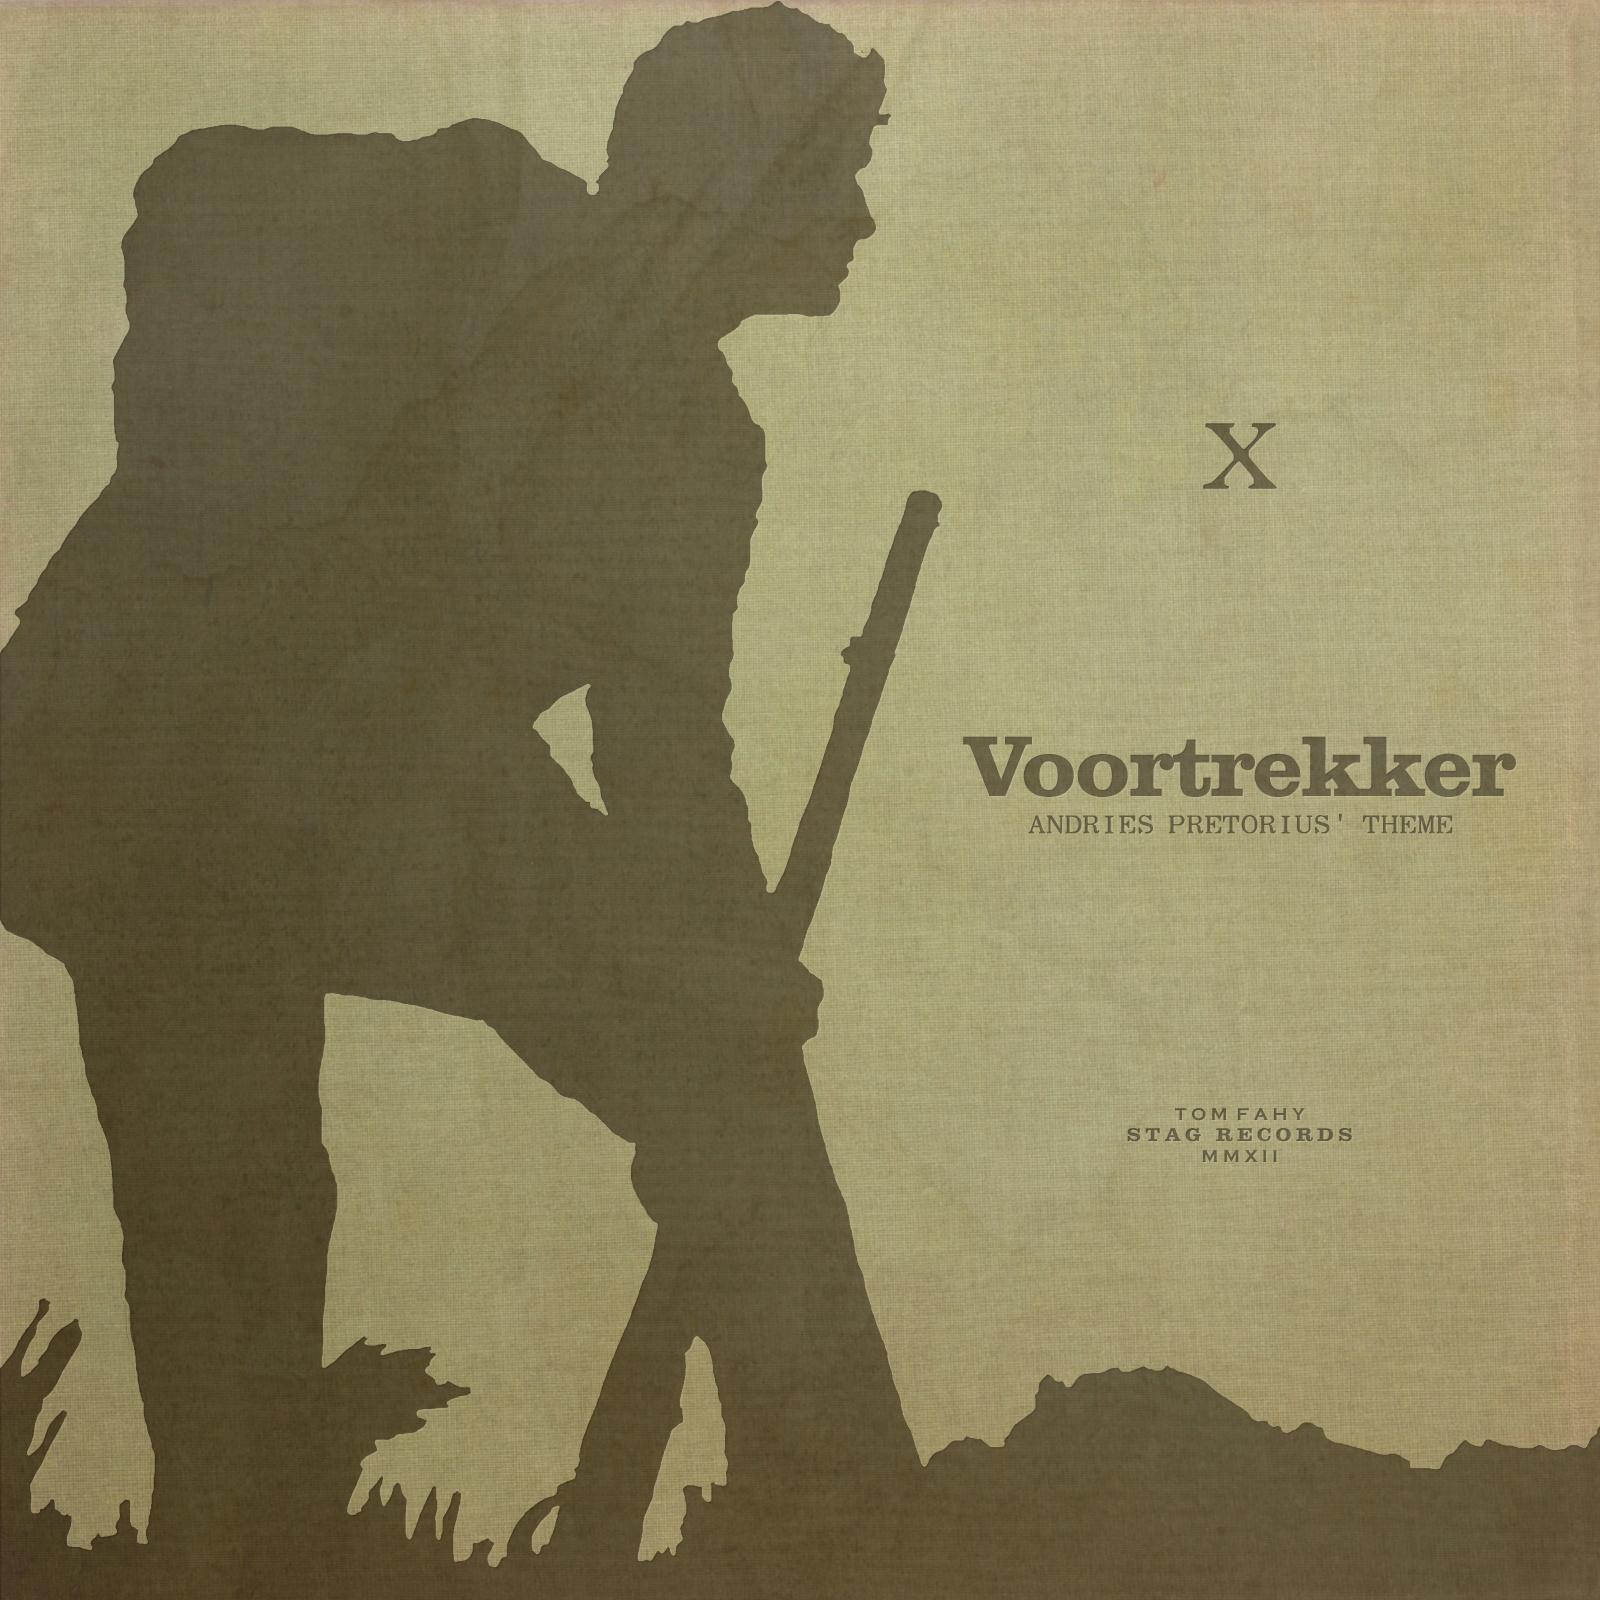 Voortrekker (Andries Pretorius' Theme) by Tom Fahy